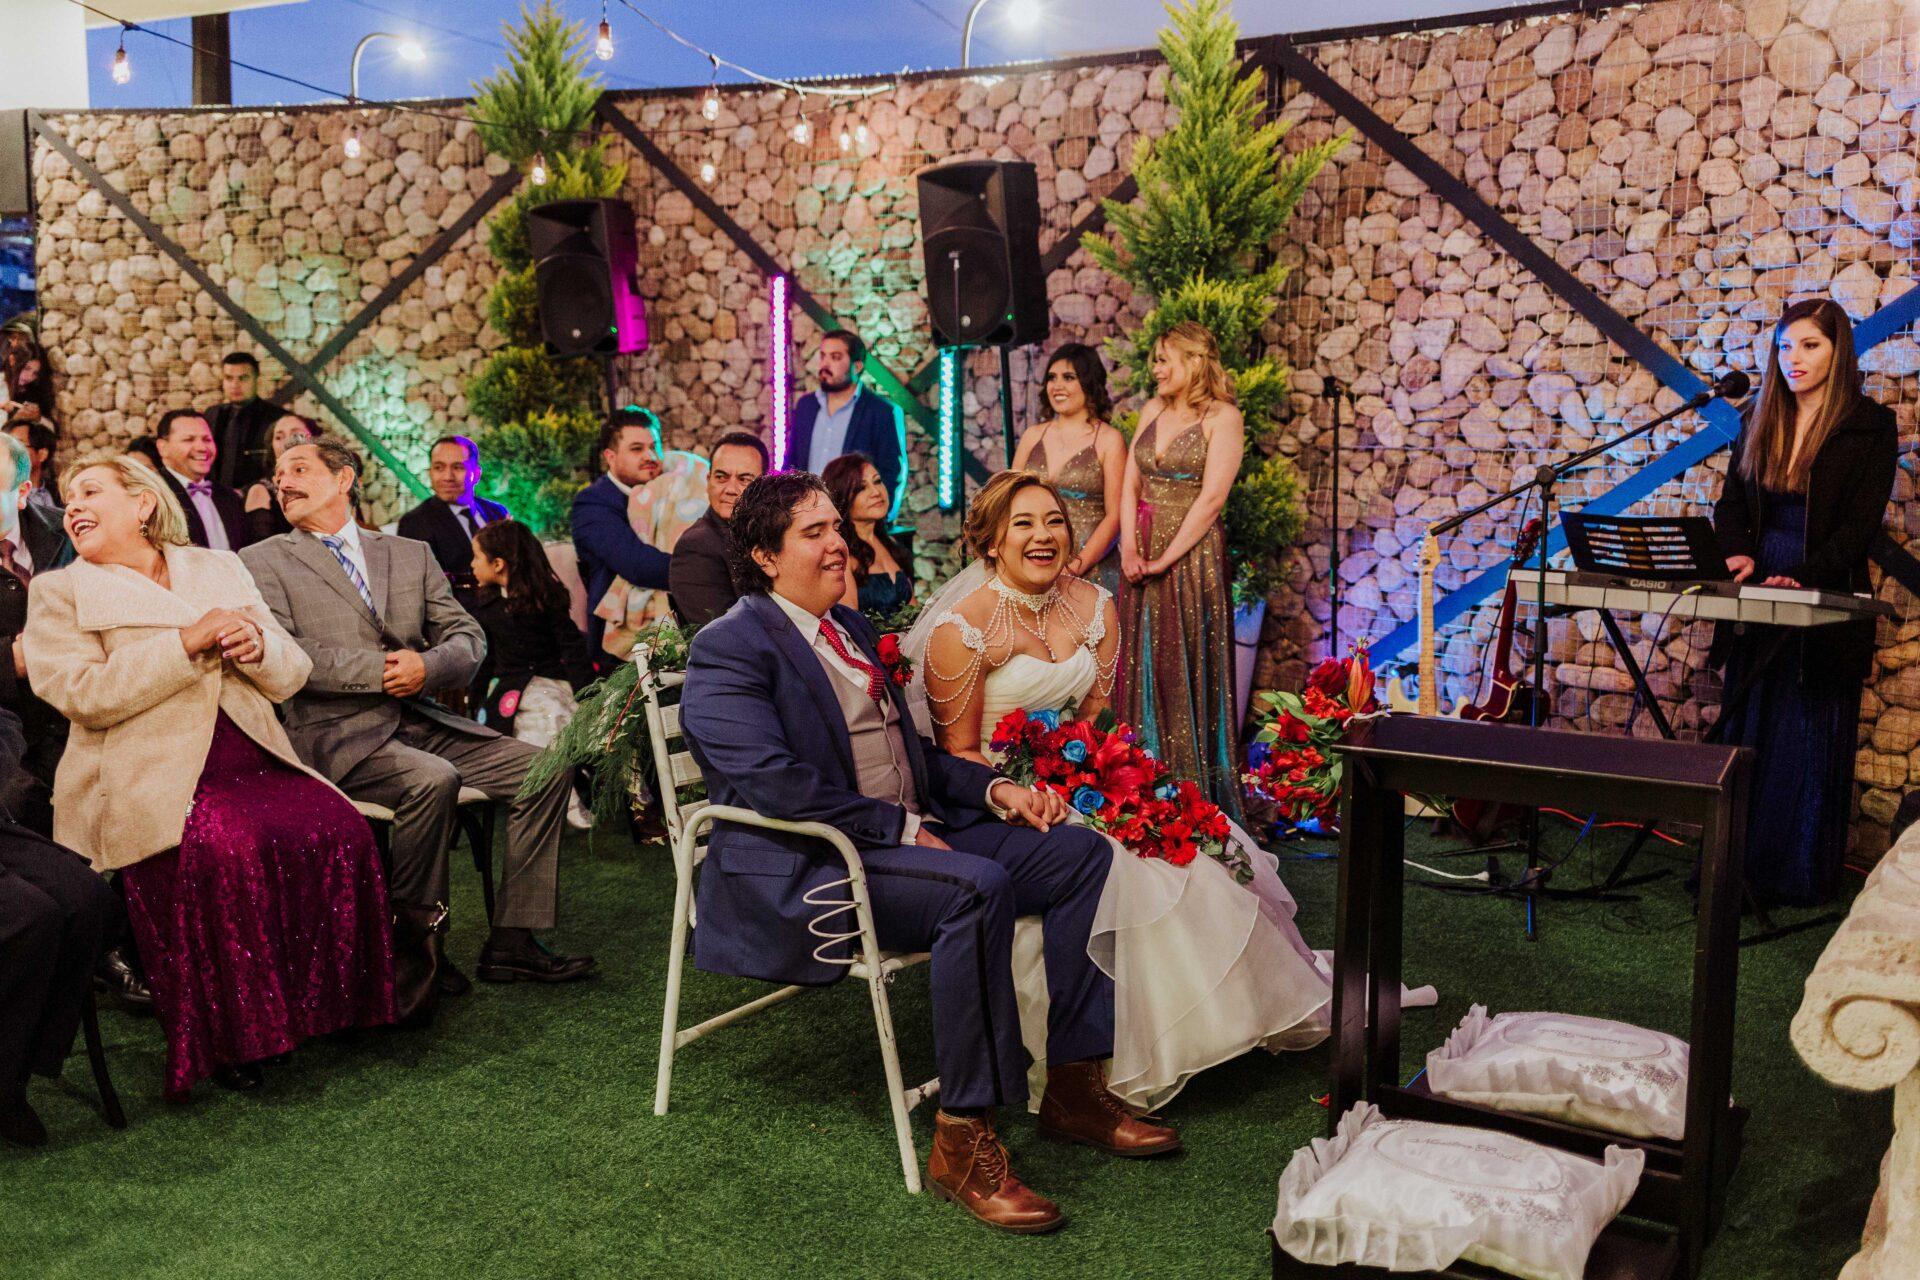 javier_noriega_fotografo_bodas_gaviones_zacatecas_wedding_photographer26